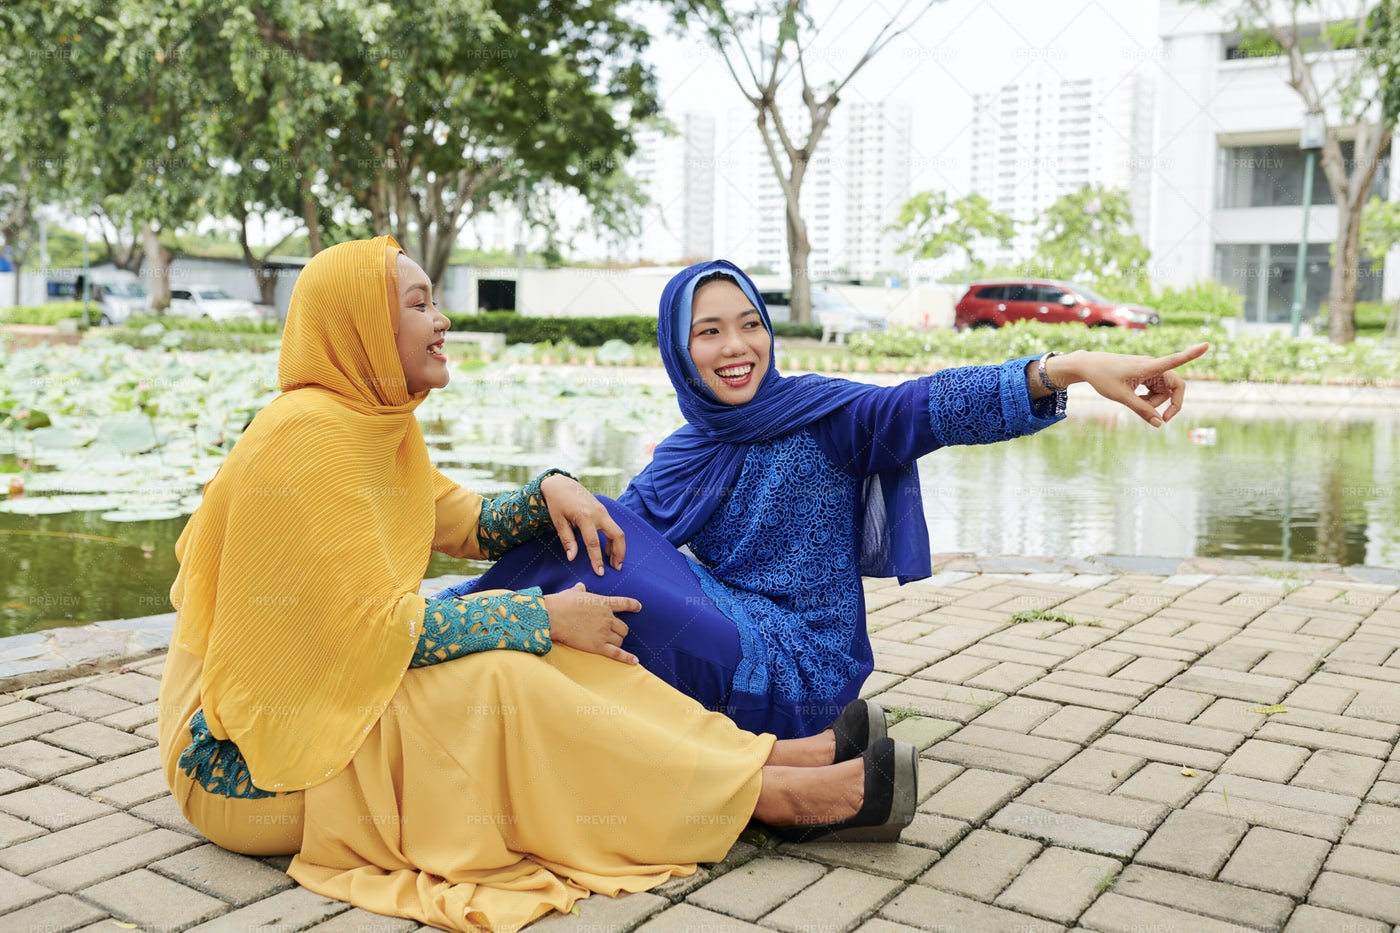 Cheerful Islamic Girls: Stock Photos